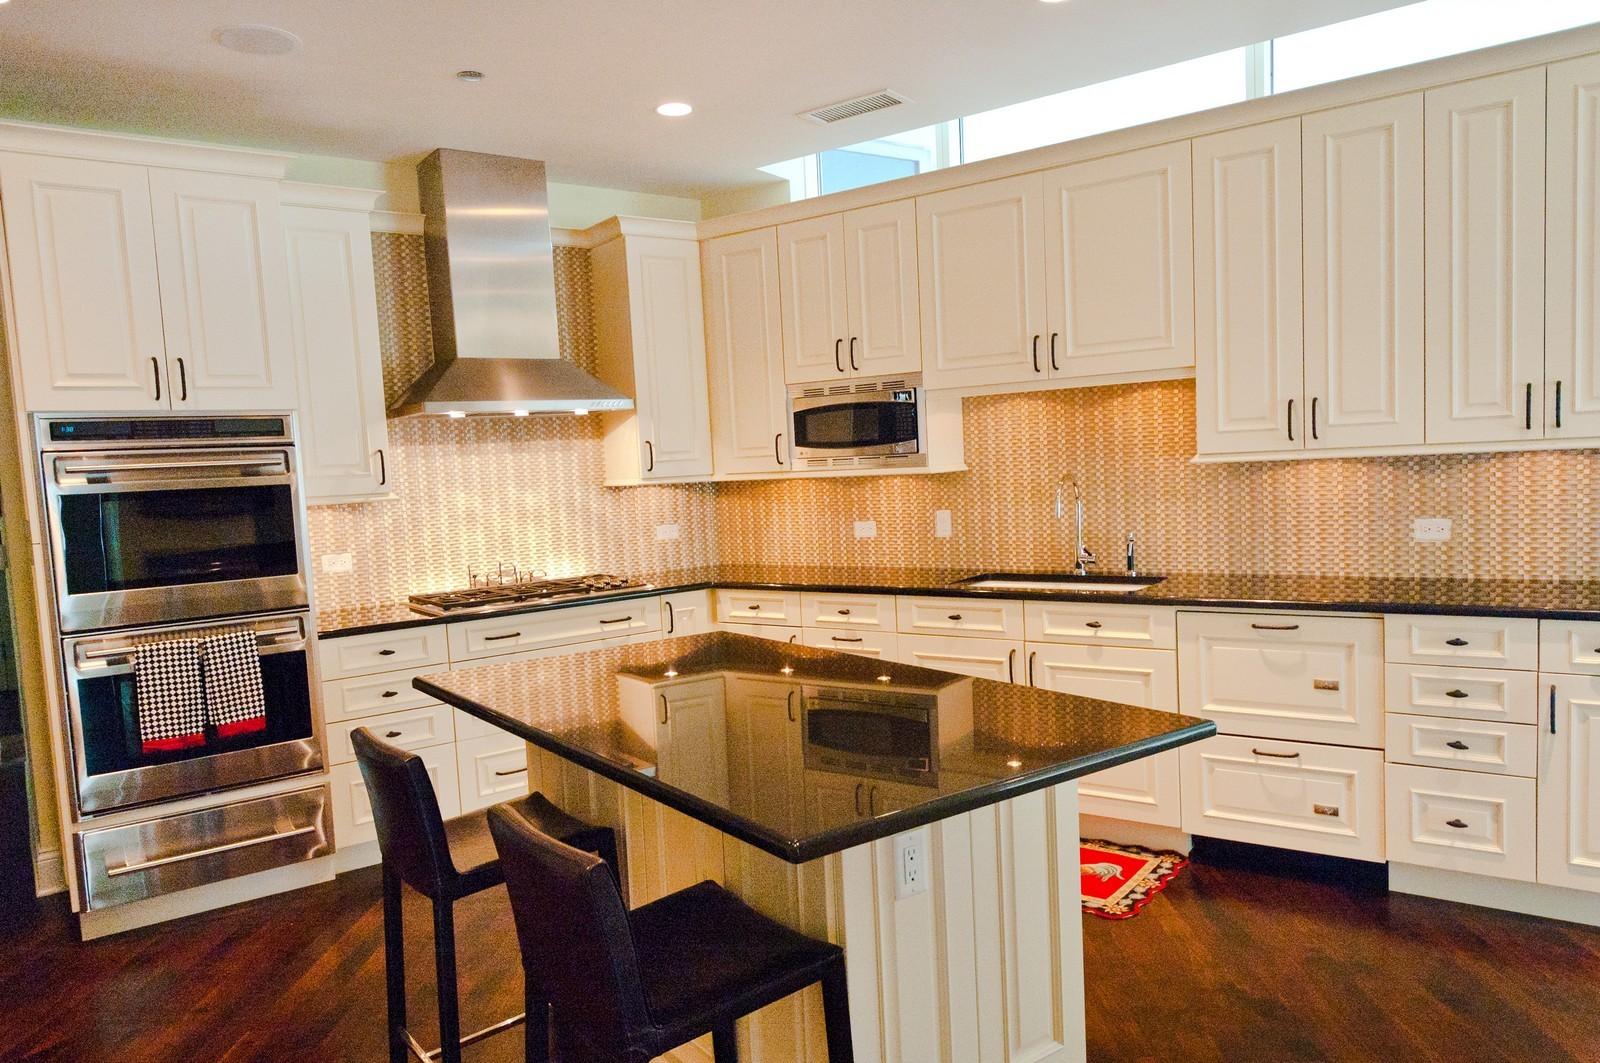 Real Estate Photography - 50 E. Chestnut, Apt 1001, Chicago, IL, 60611 - Kitchen 1